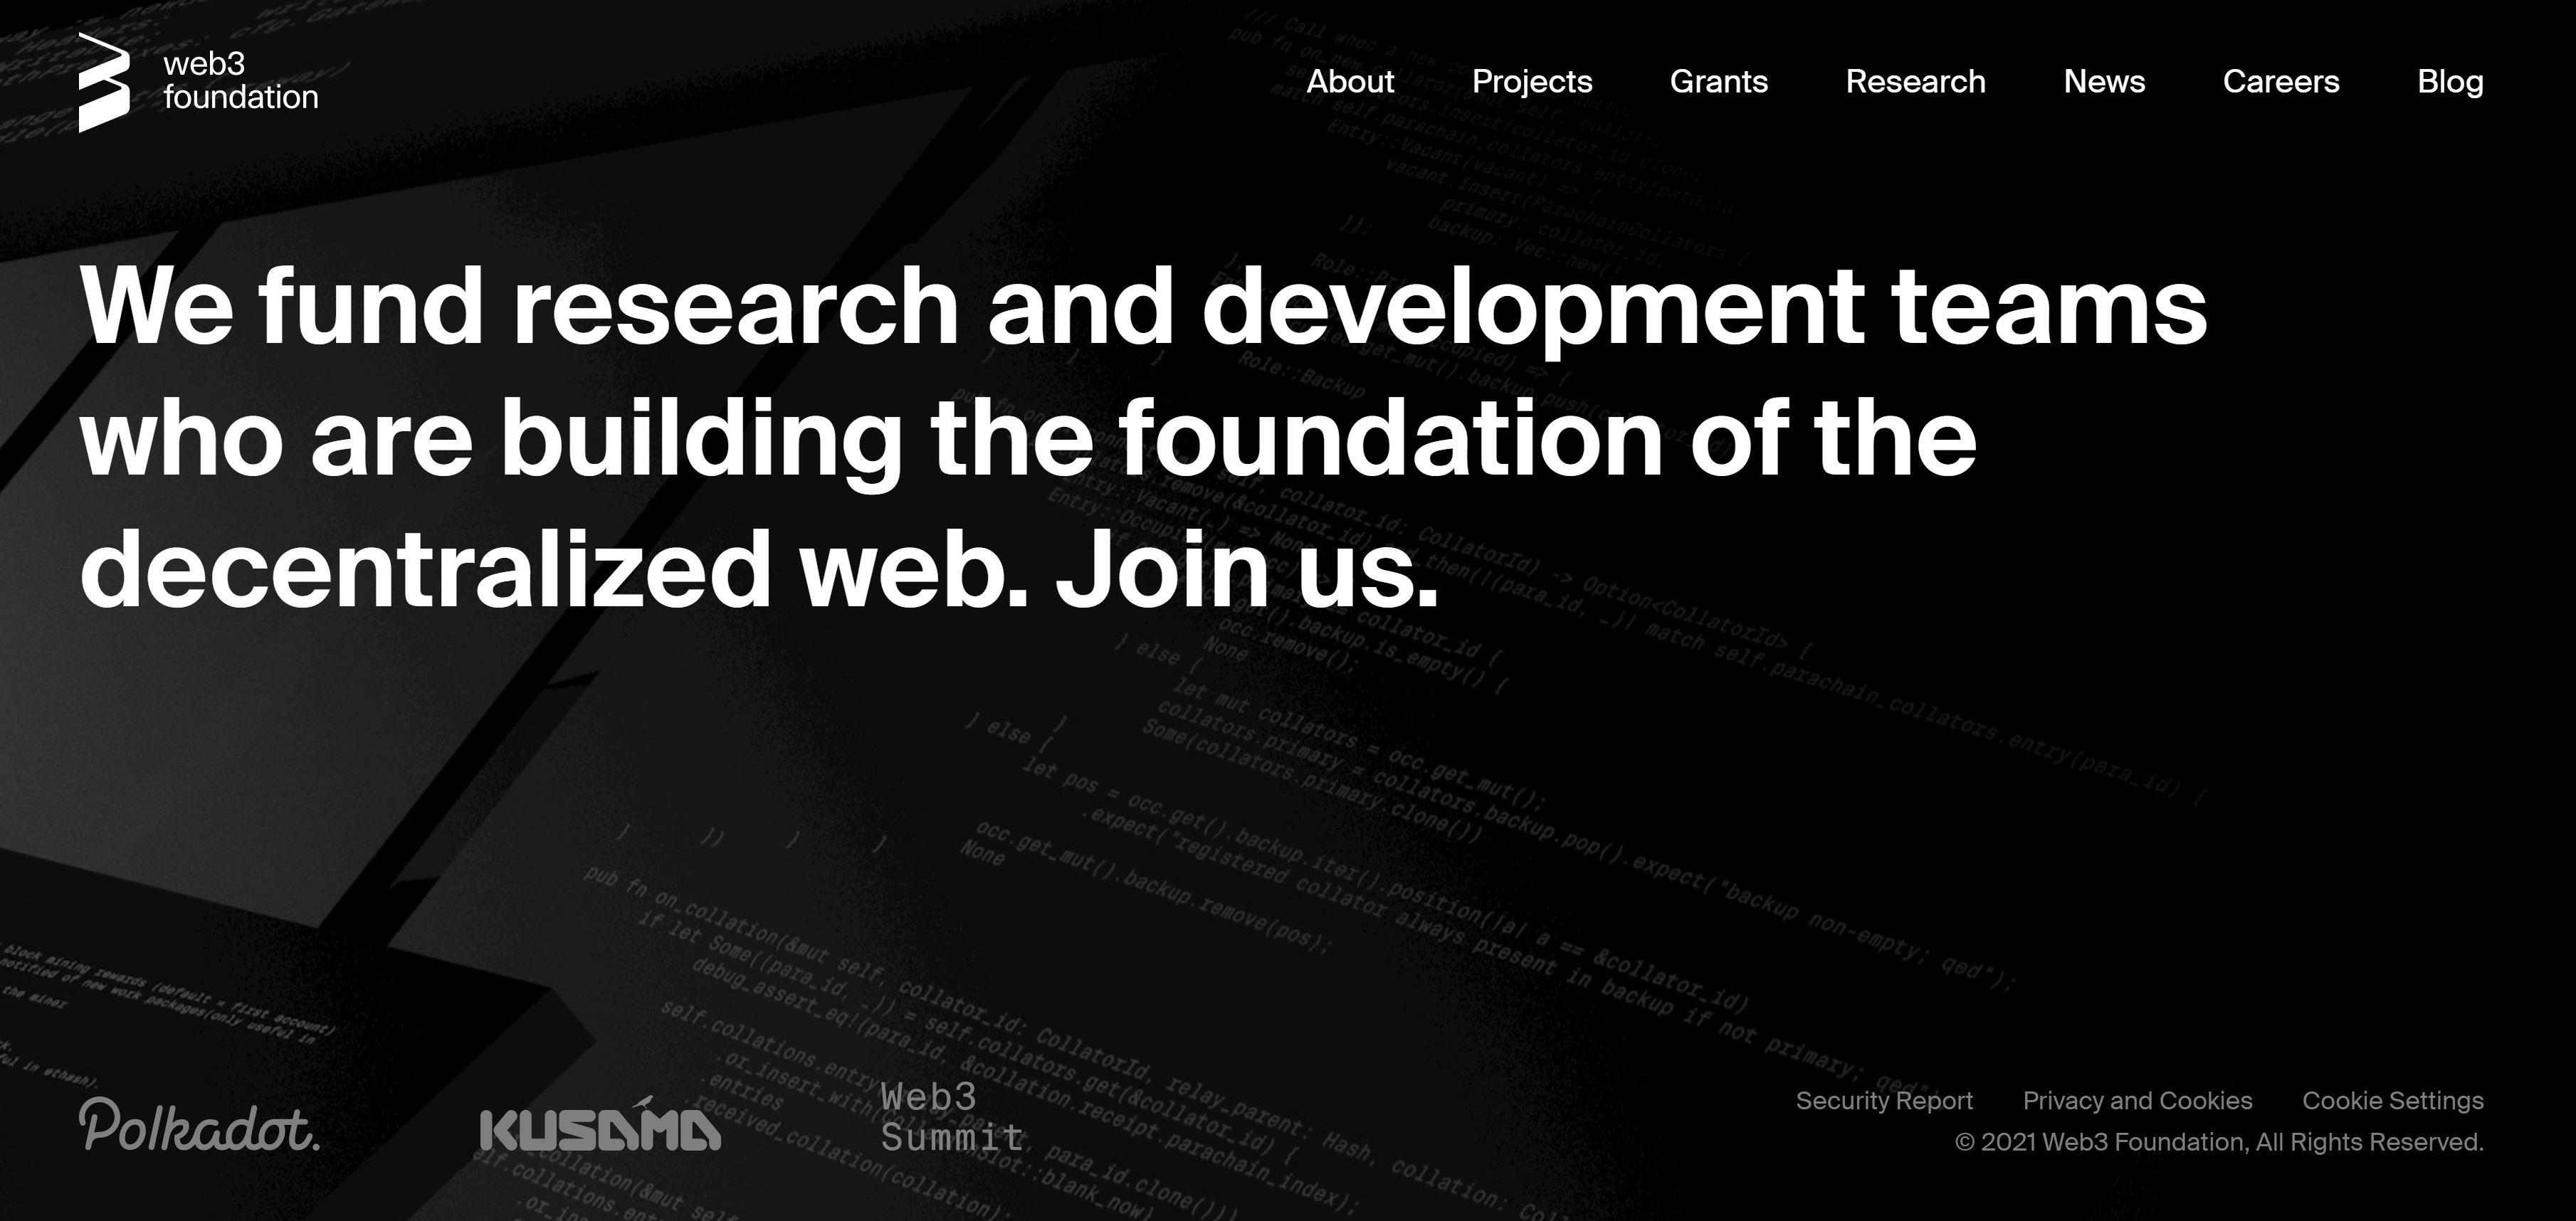 Les supporters de Polkadot Fondation Web3